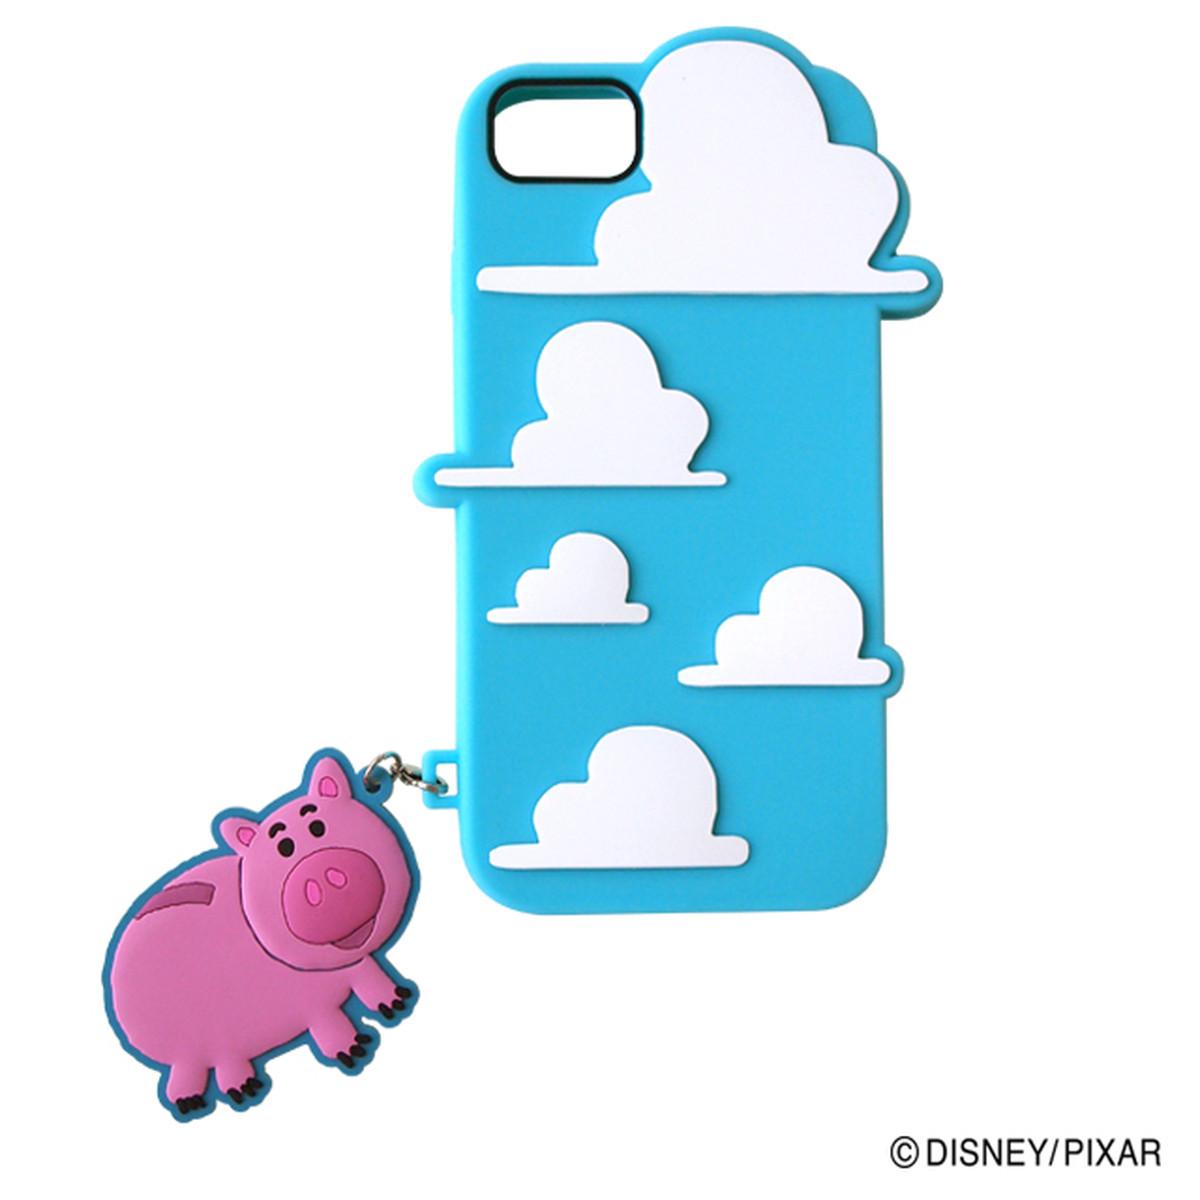 Disney Pixar Pixar Silicone Iphone Case Yy D038 Cl Yooy